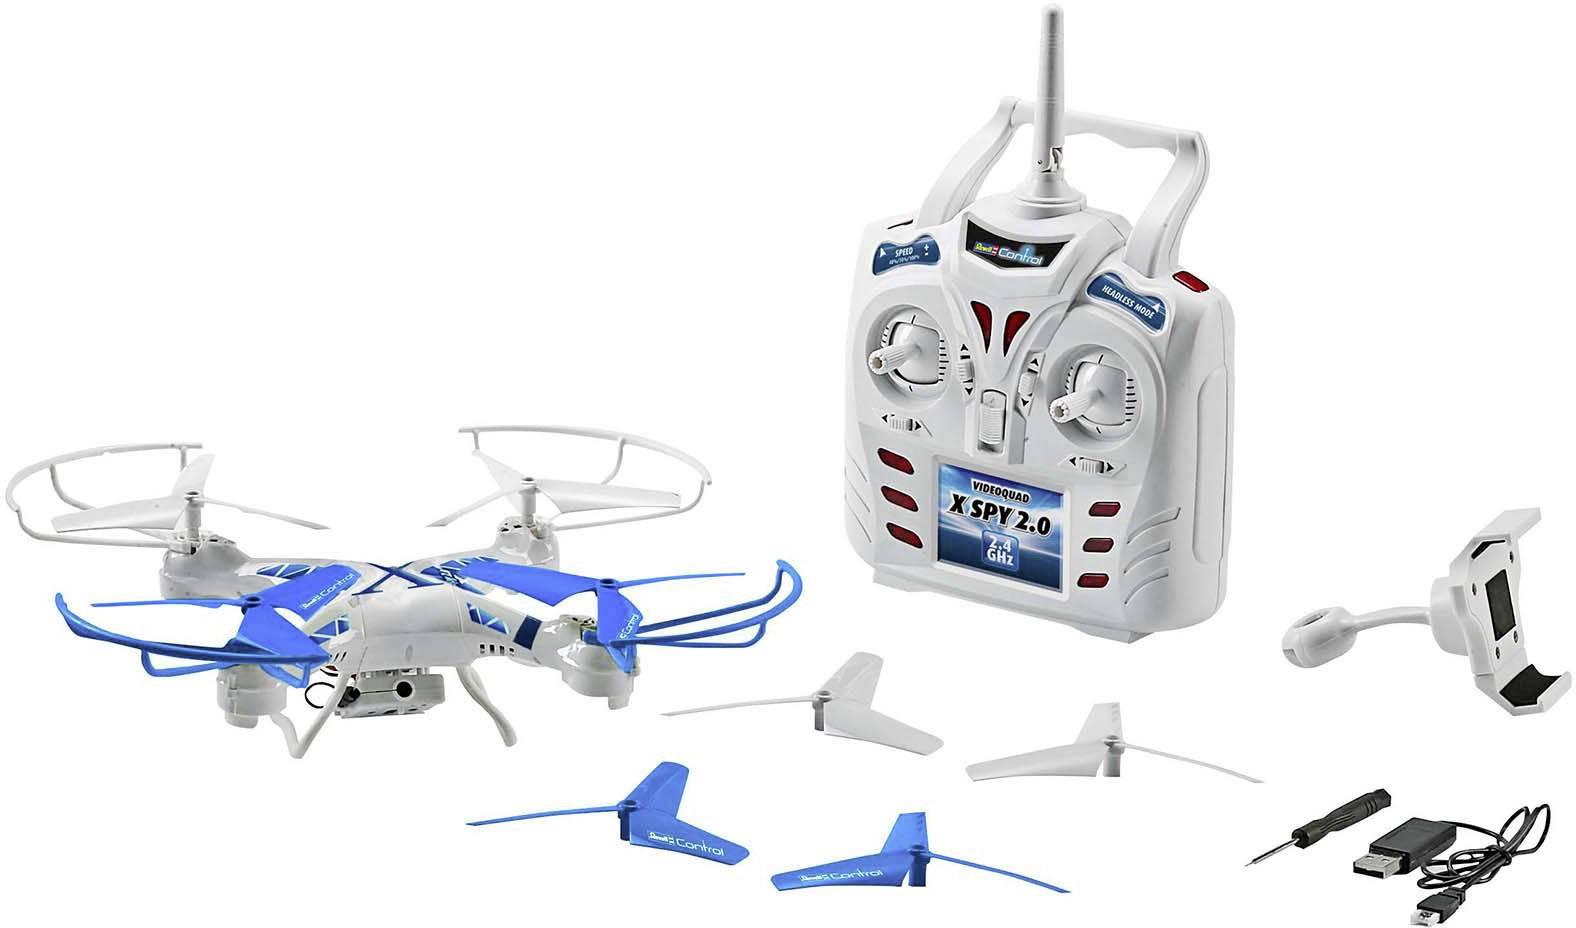 Dron Revell Control X-Spy 2.0, RtF